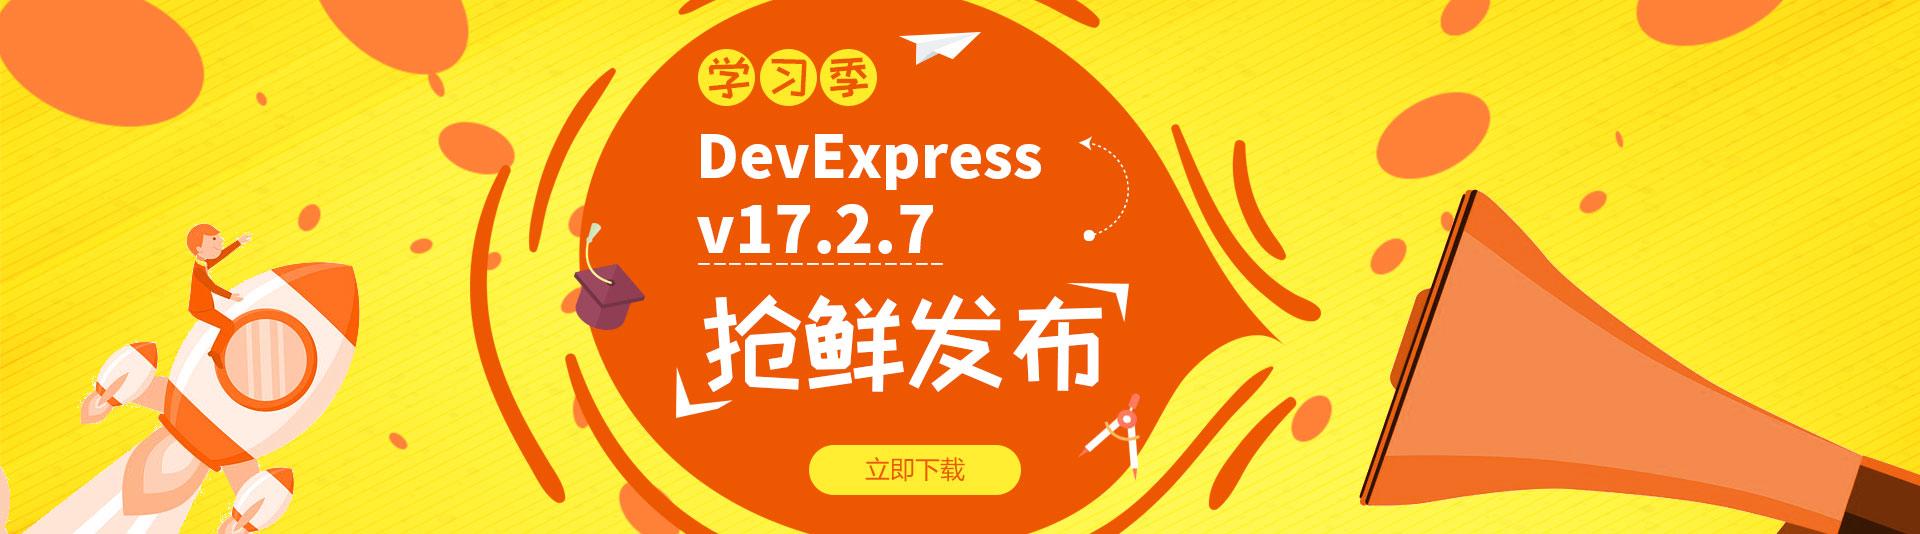 DevExpress v17.2.7发布